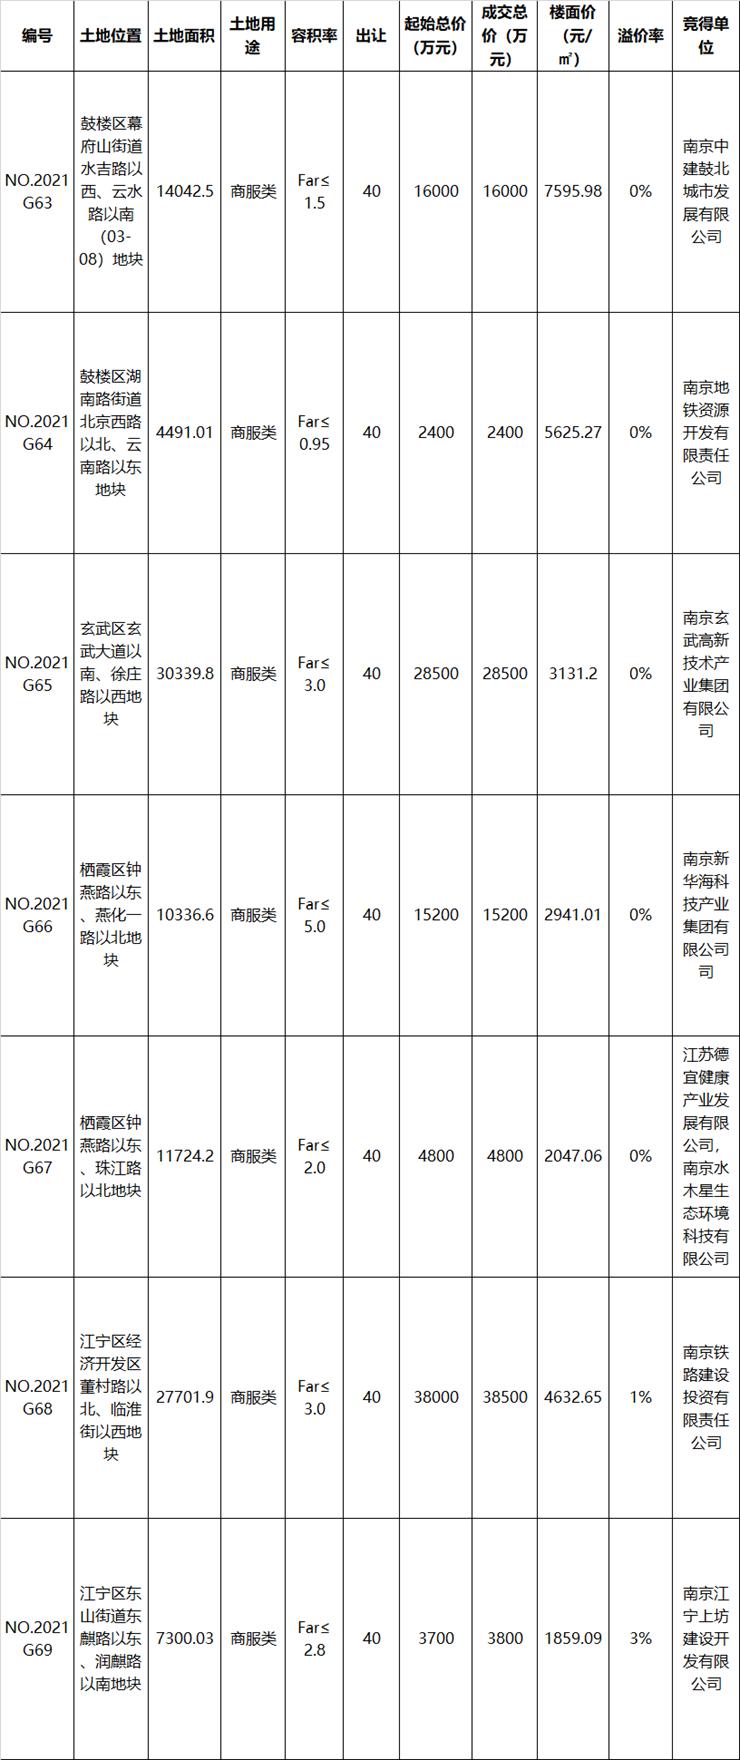 db4c86e2d60b5e9c364907fd6cee59cc.png